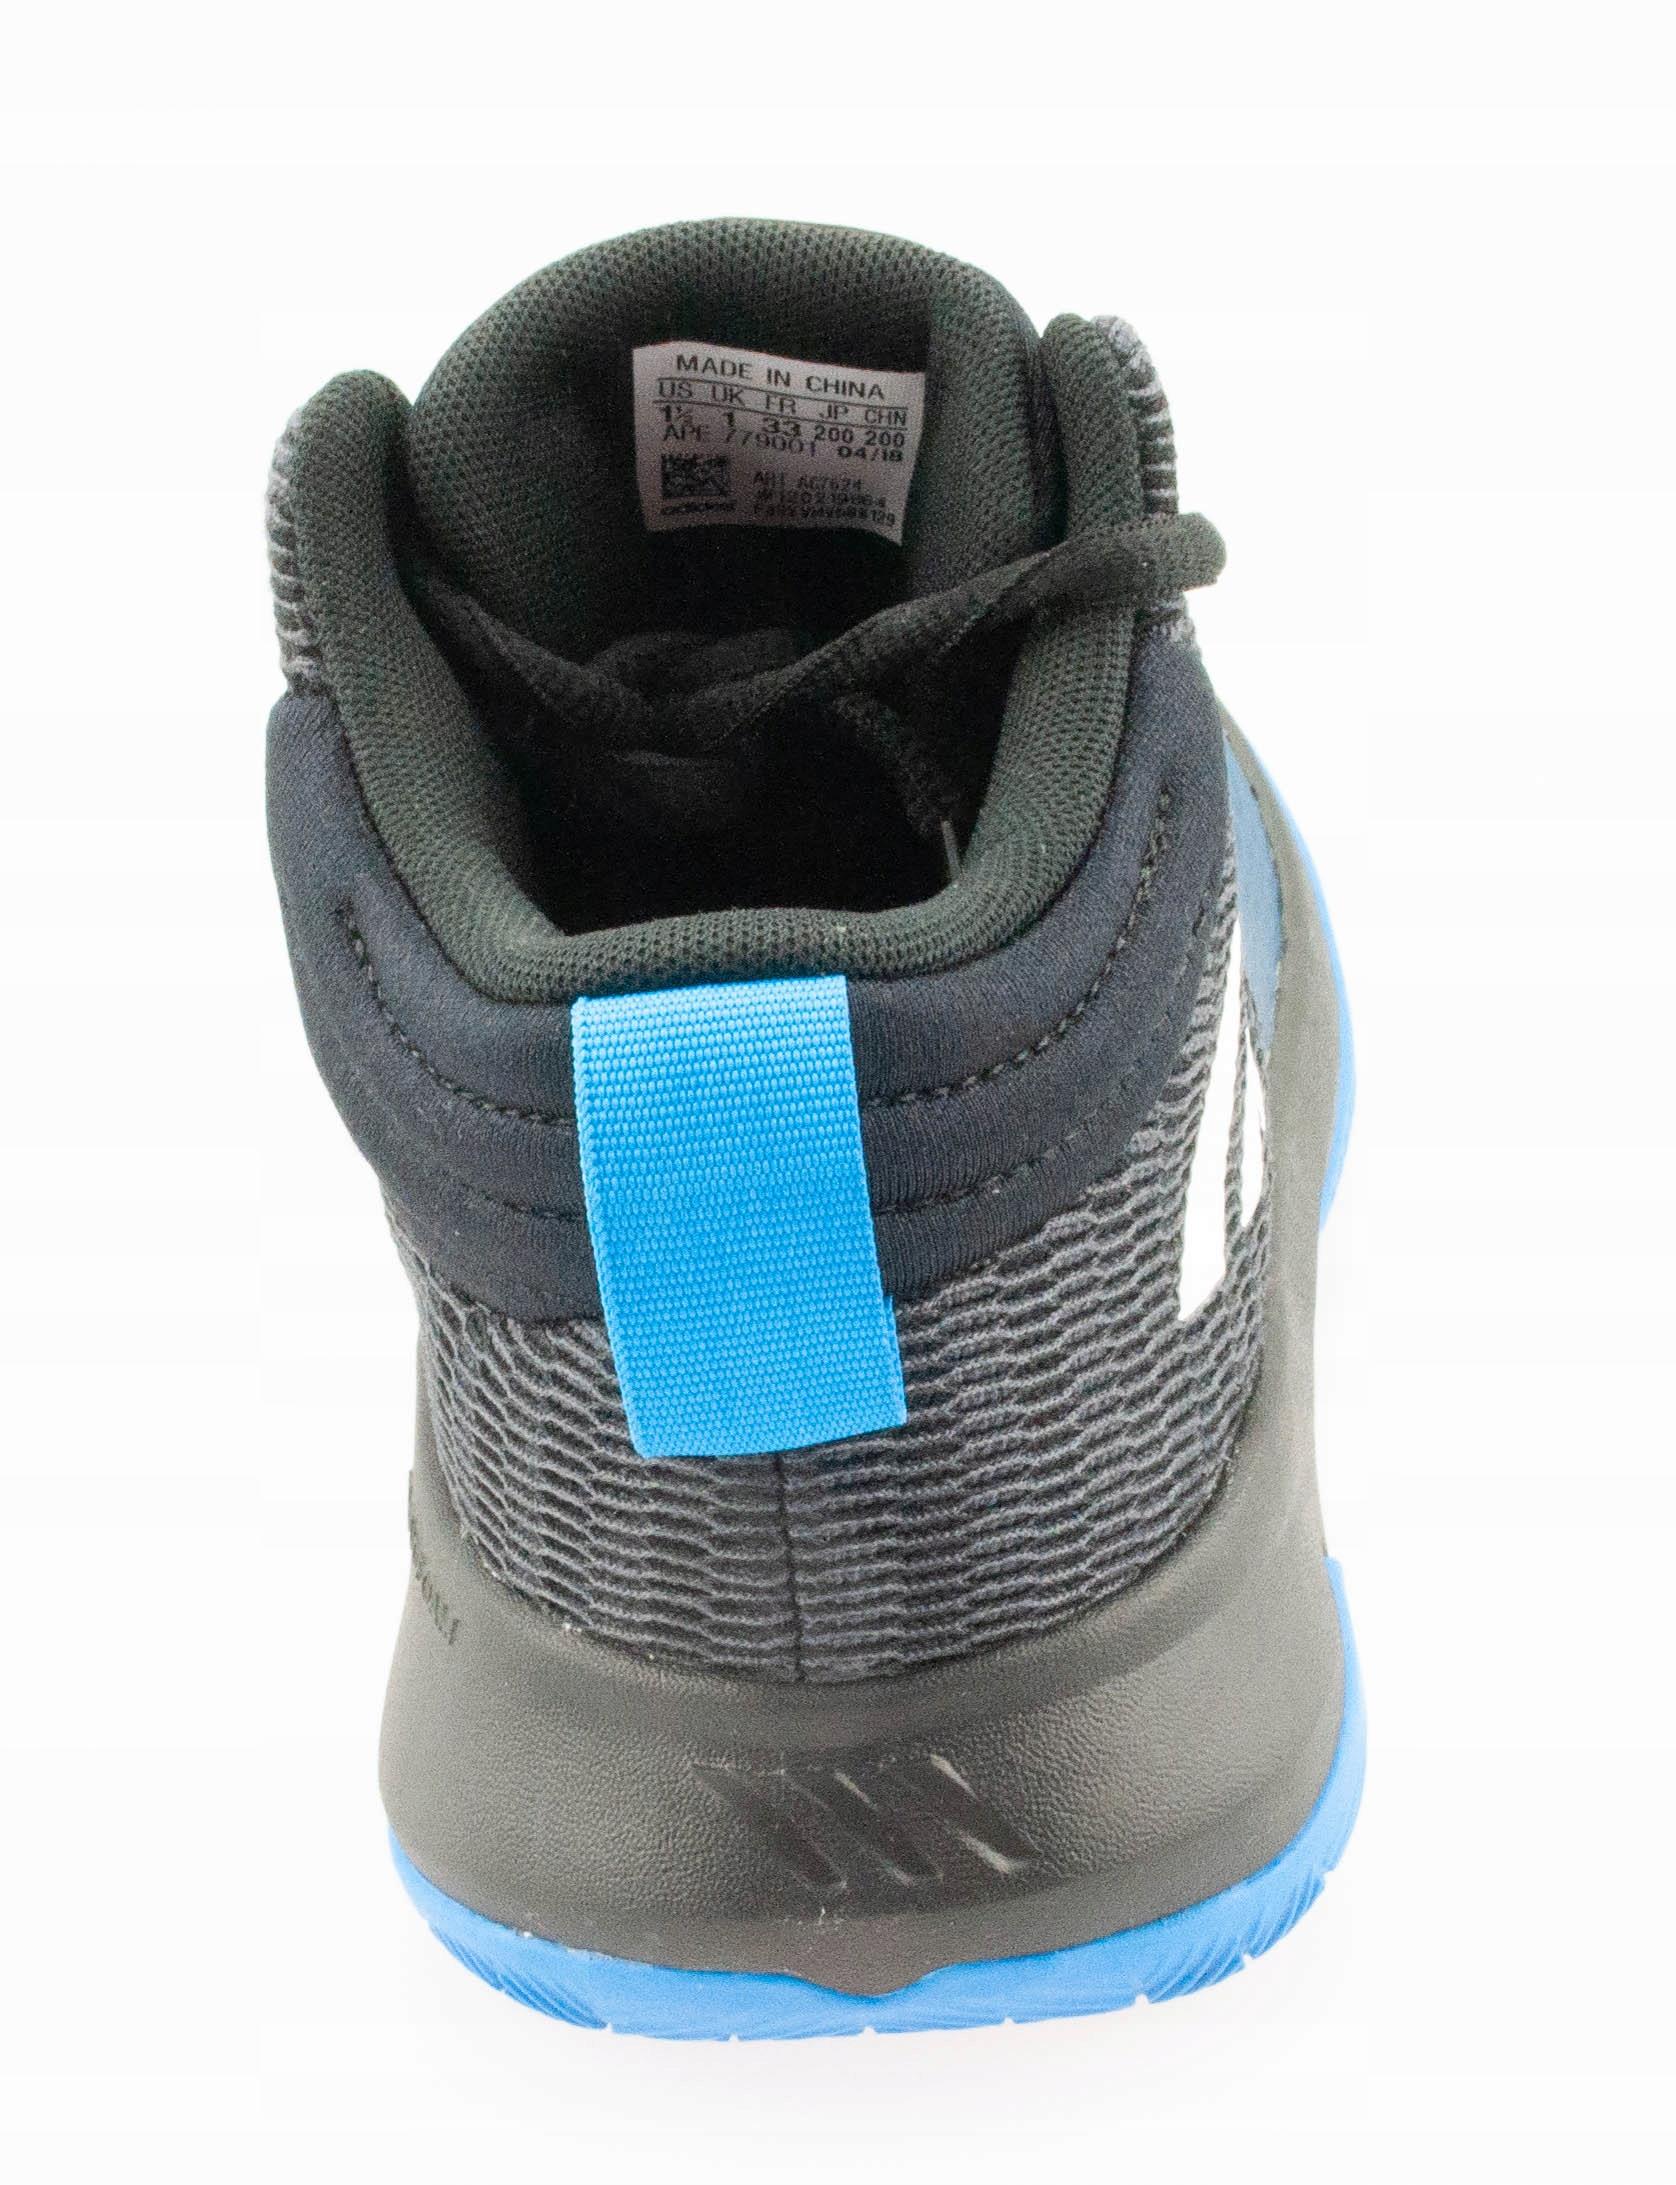 new style eac57 716ab Adidas PRO ELEVATE 2018 do koszykówki r.33 (7683136929)